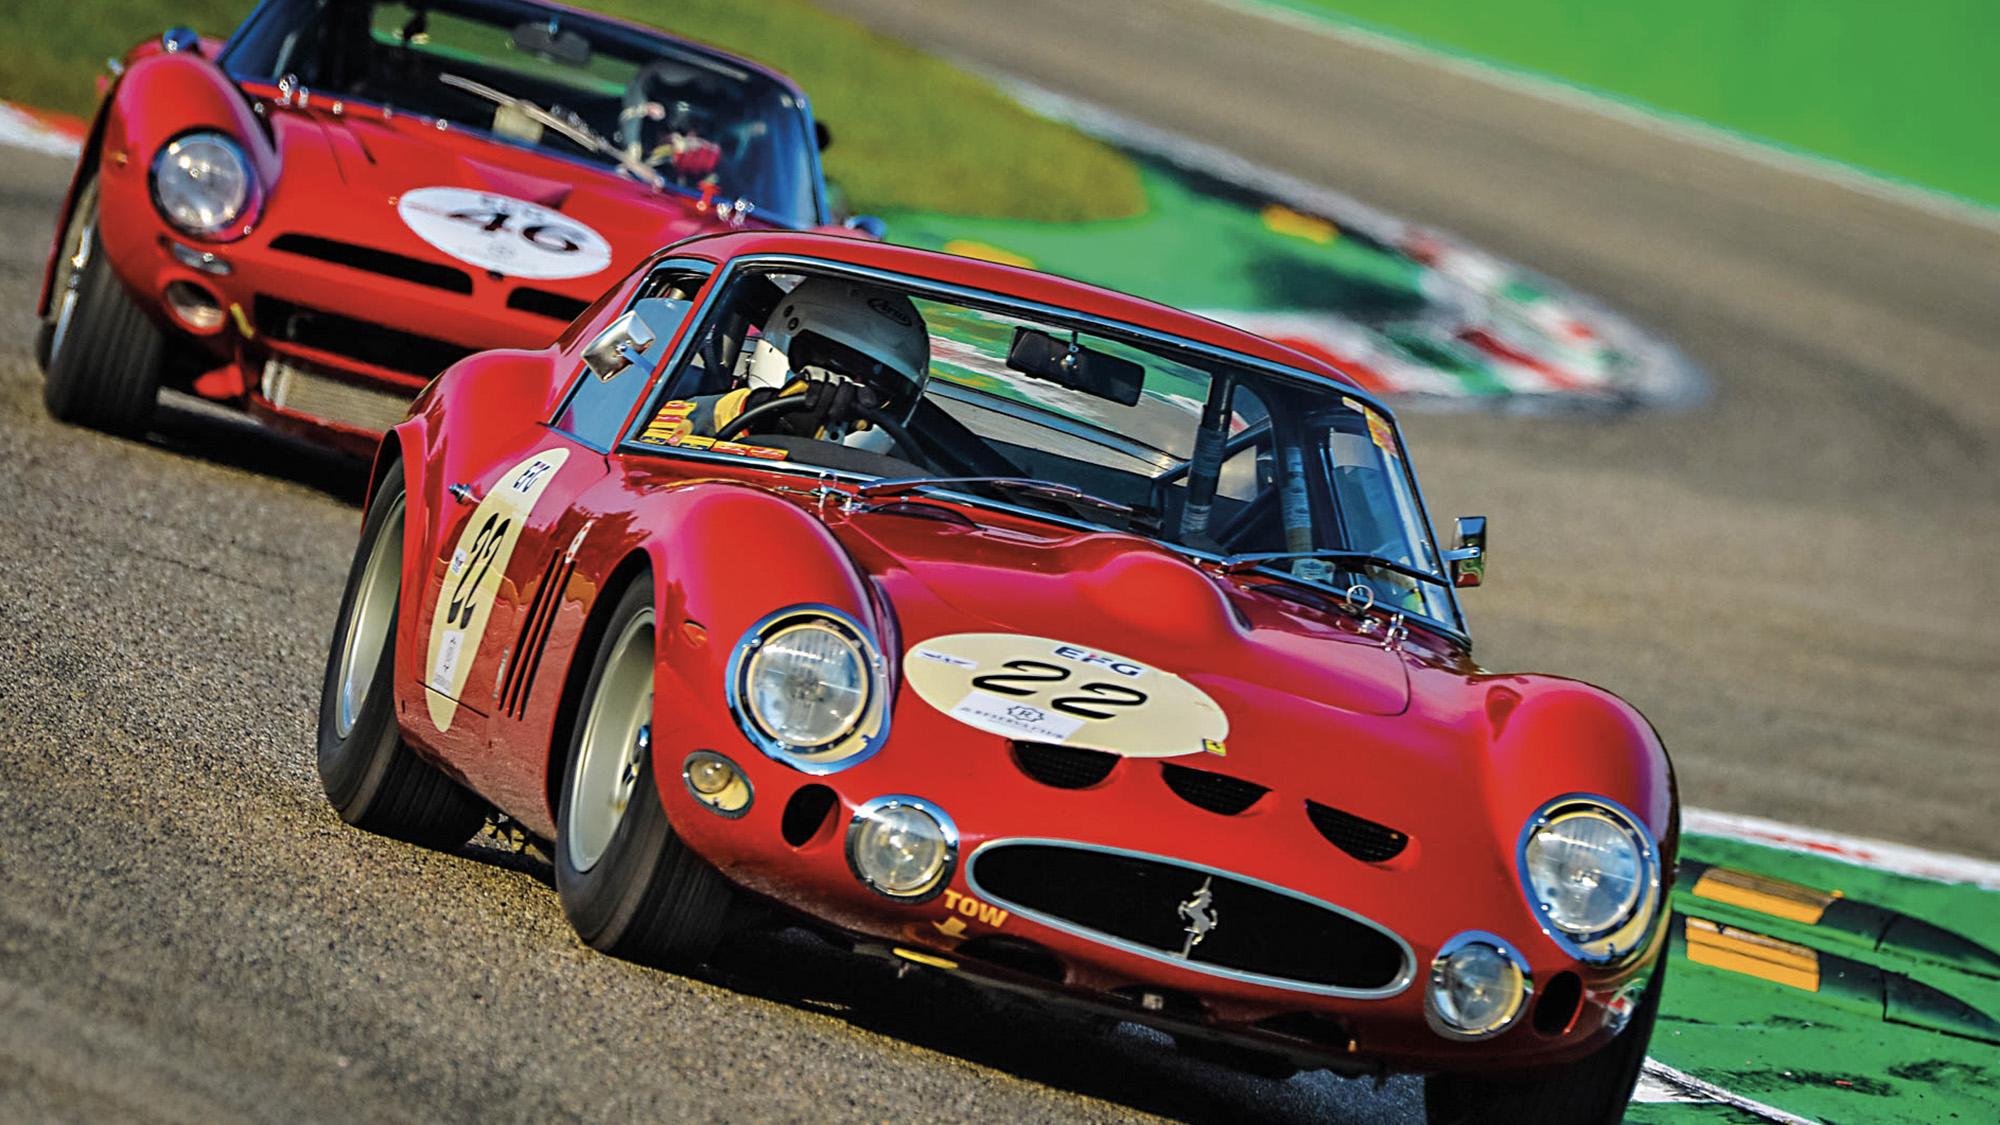 Ferrari at the Monza Historic event